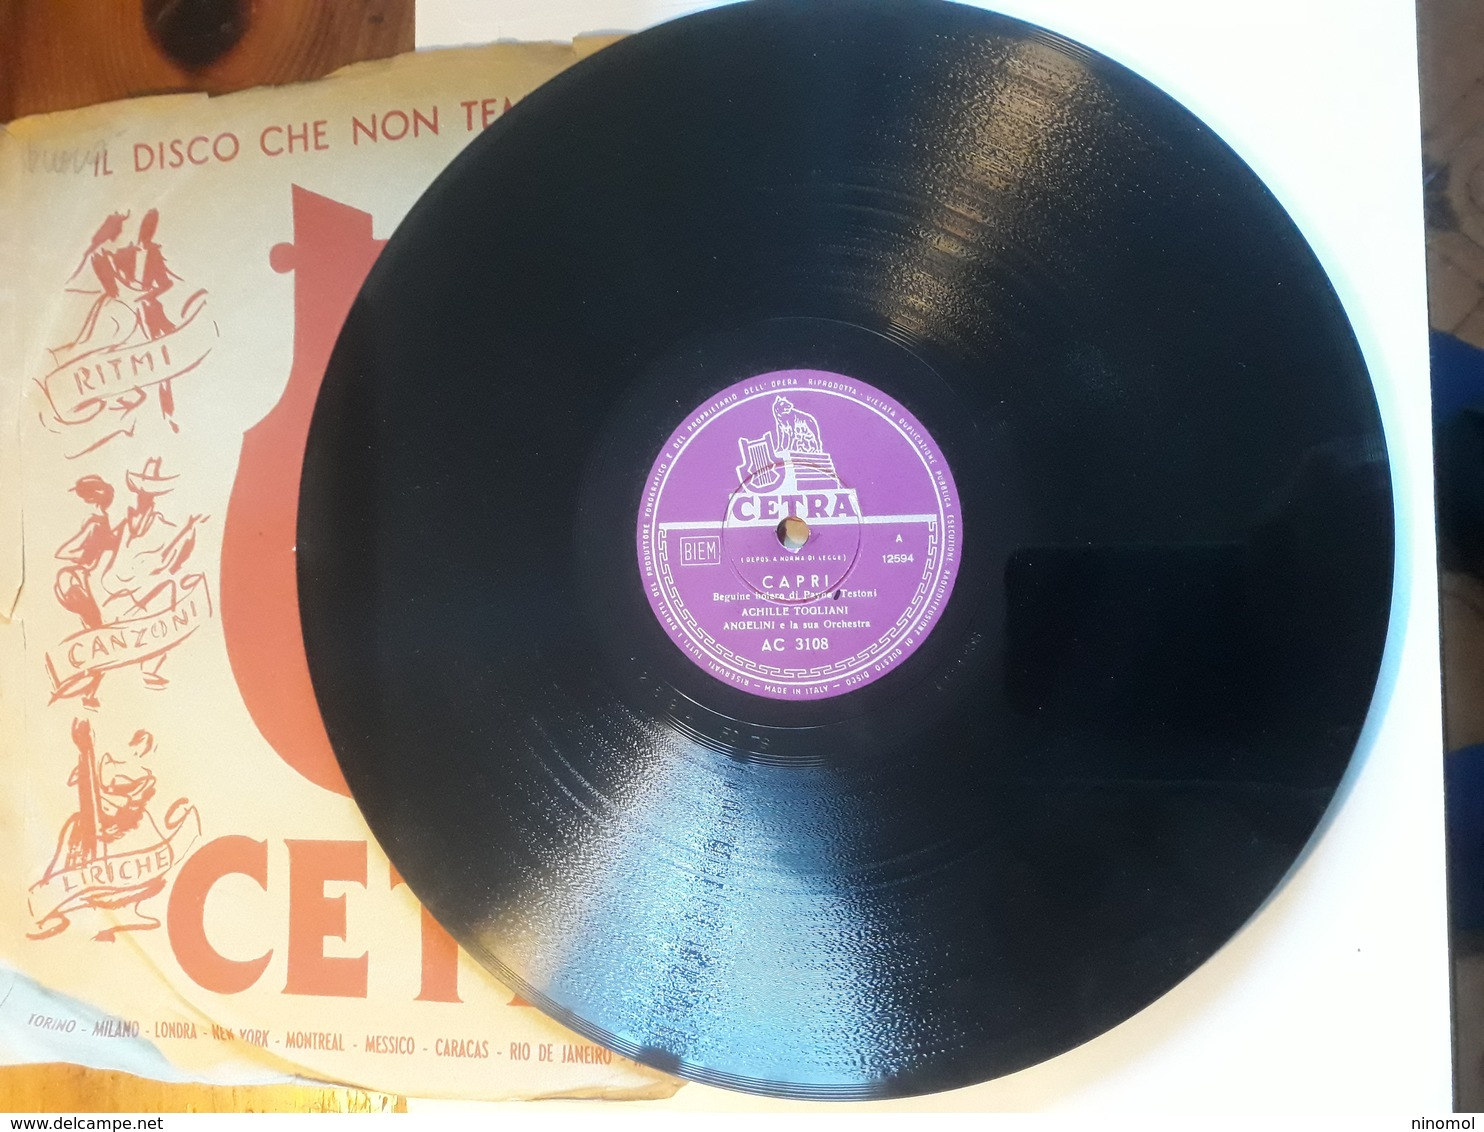 Cetra   -  1956.  Serie AC  Nr. 3108  -   Achille Togliani - 78 G - Dischi Per Fonografi